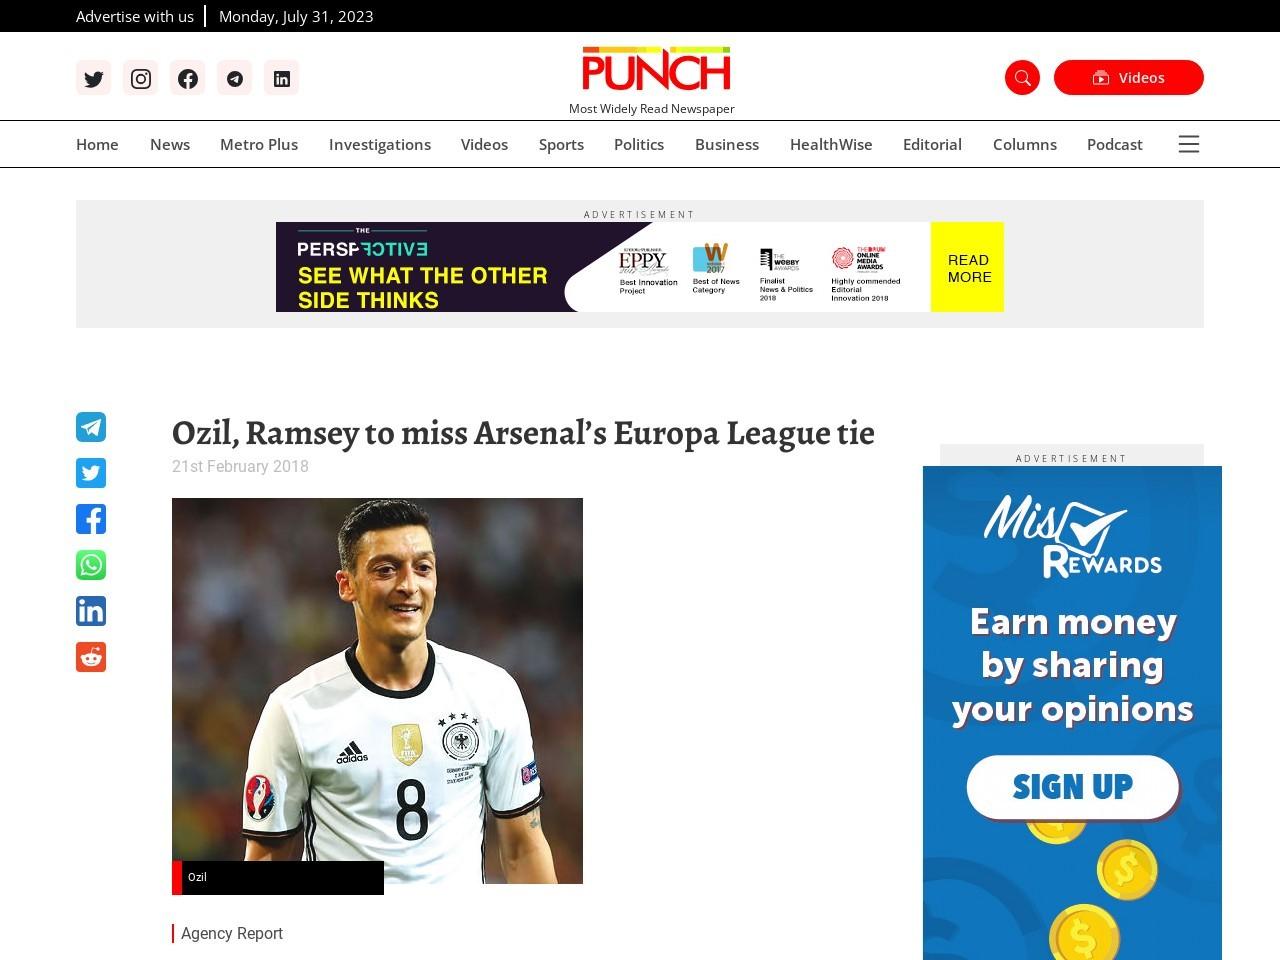 Ozil, Ramsey to miss Arsenal's Europa League tie